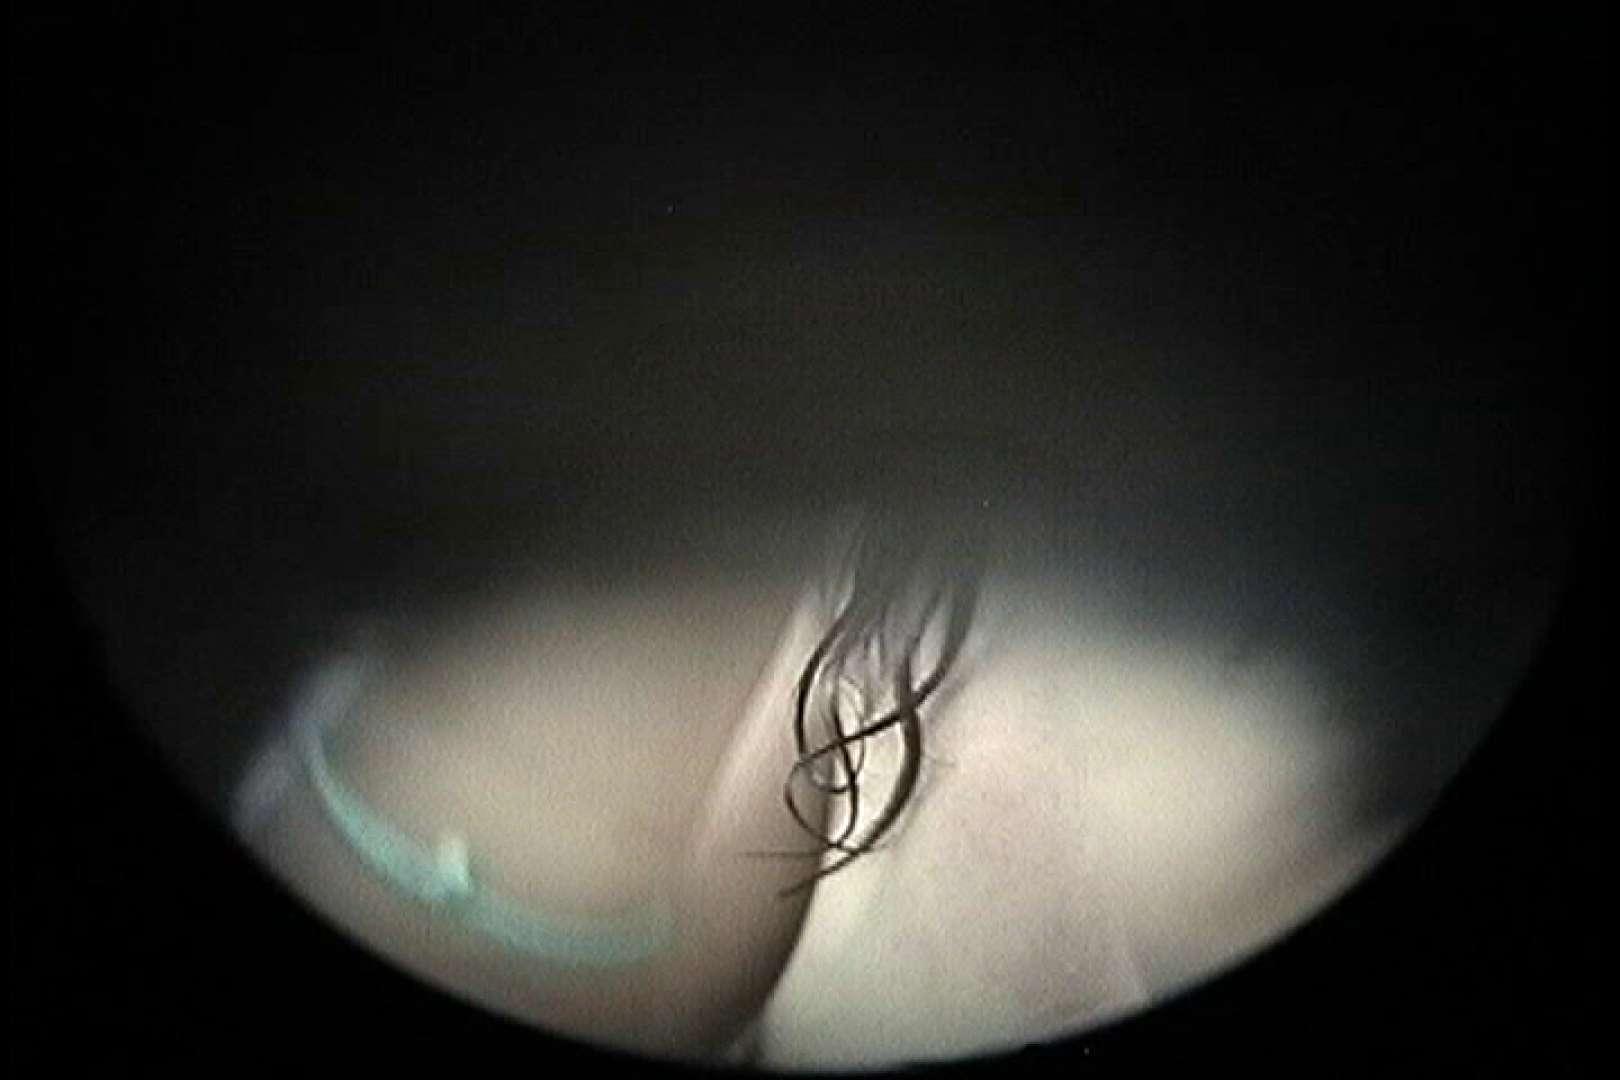 No.24 ビキニの割には陰毛は獰猛、ハミ毛が心配 接写  110枚 46